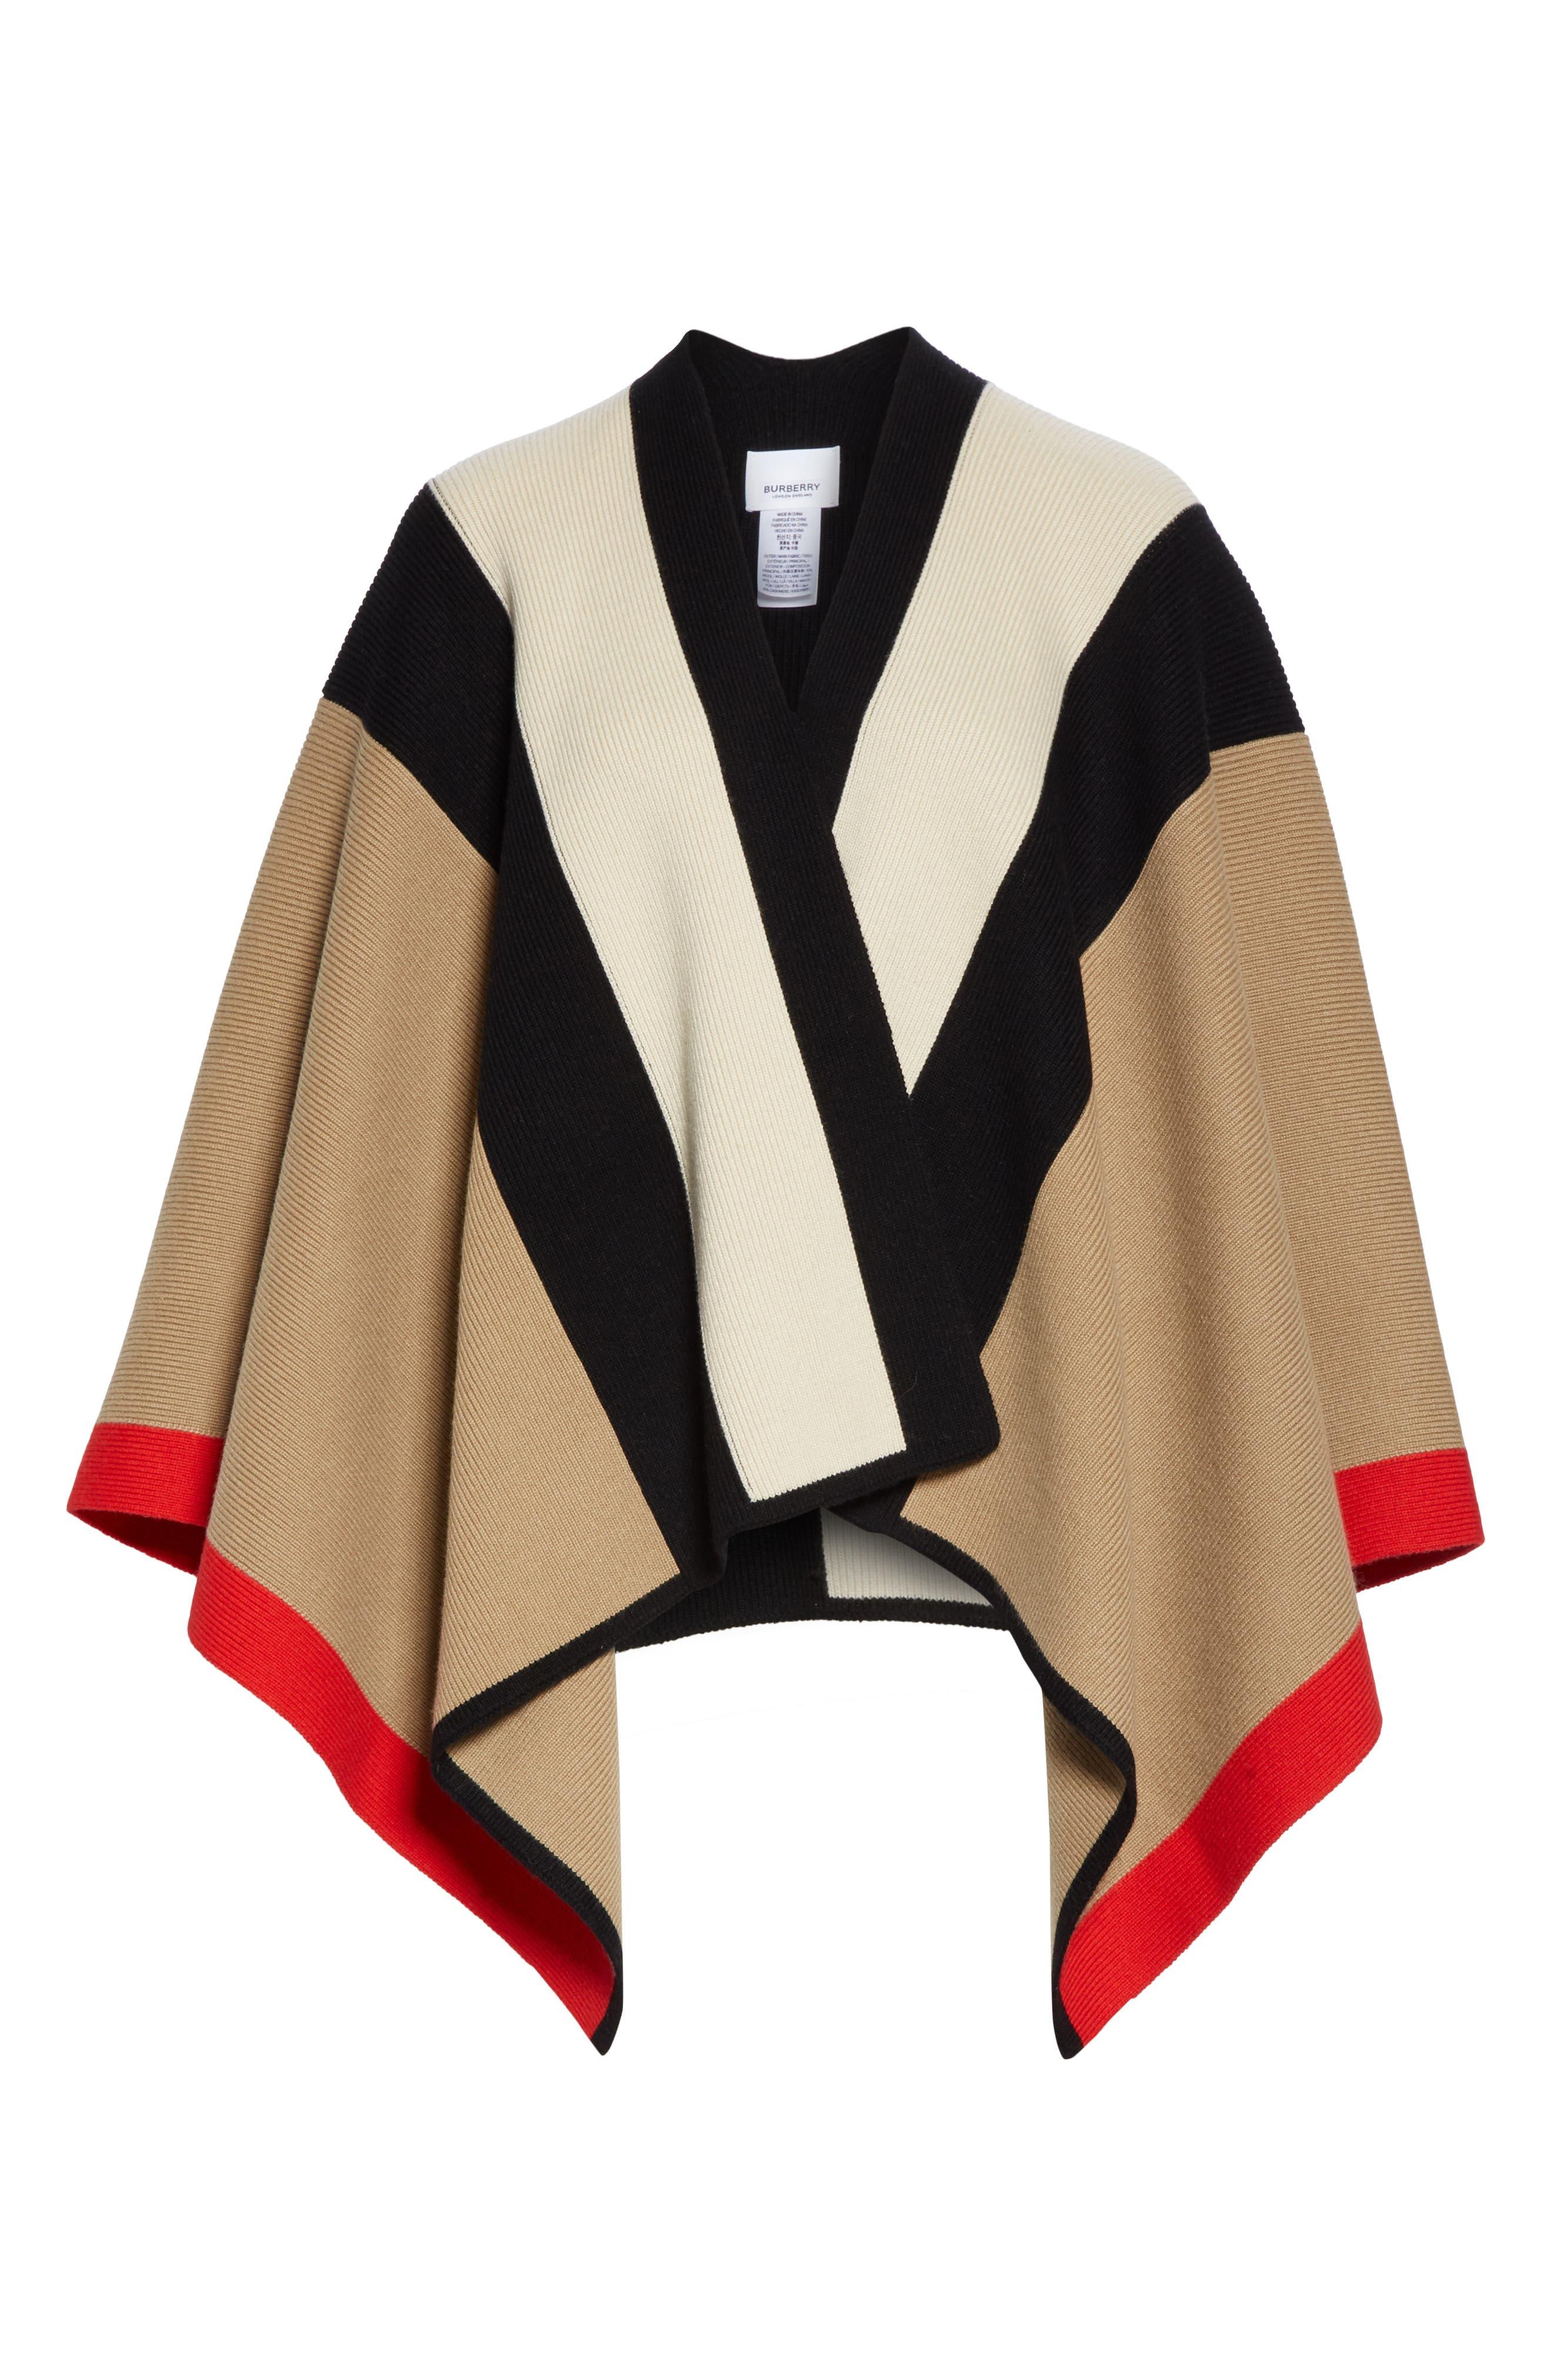 BURBERRY, Stripe Wool & Cashmere Cape, Alternate thumbnail 6, color, CAMEL